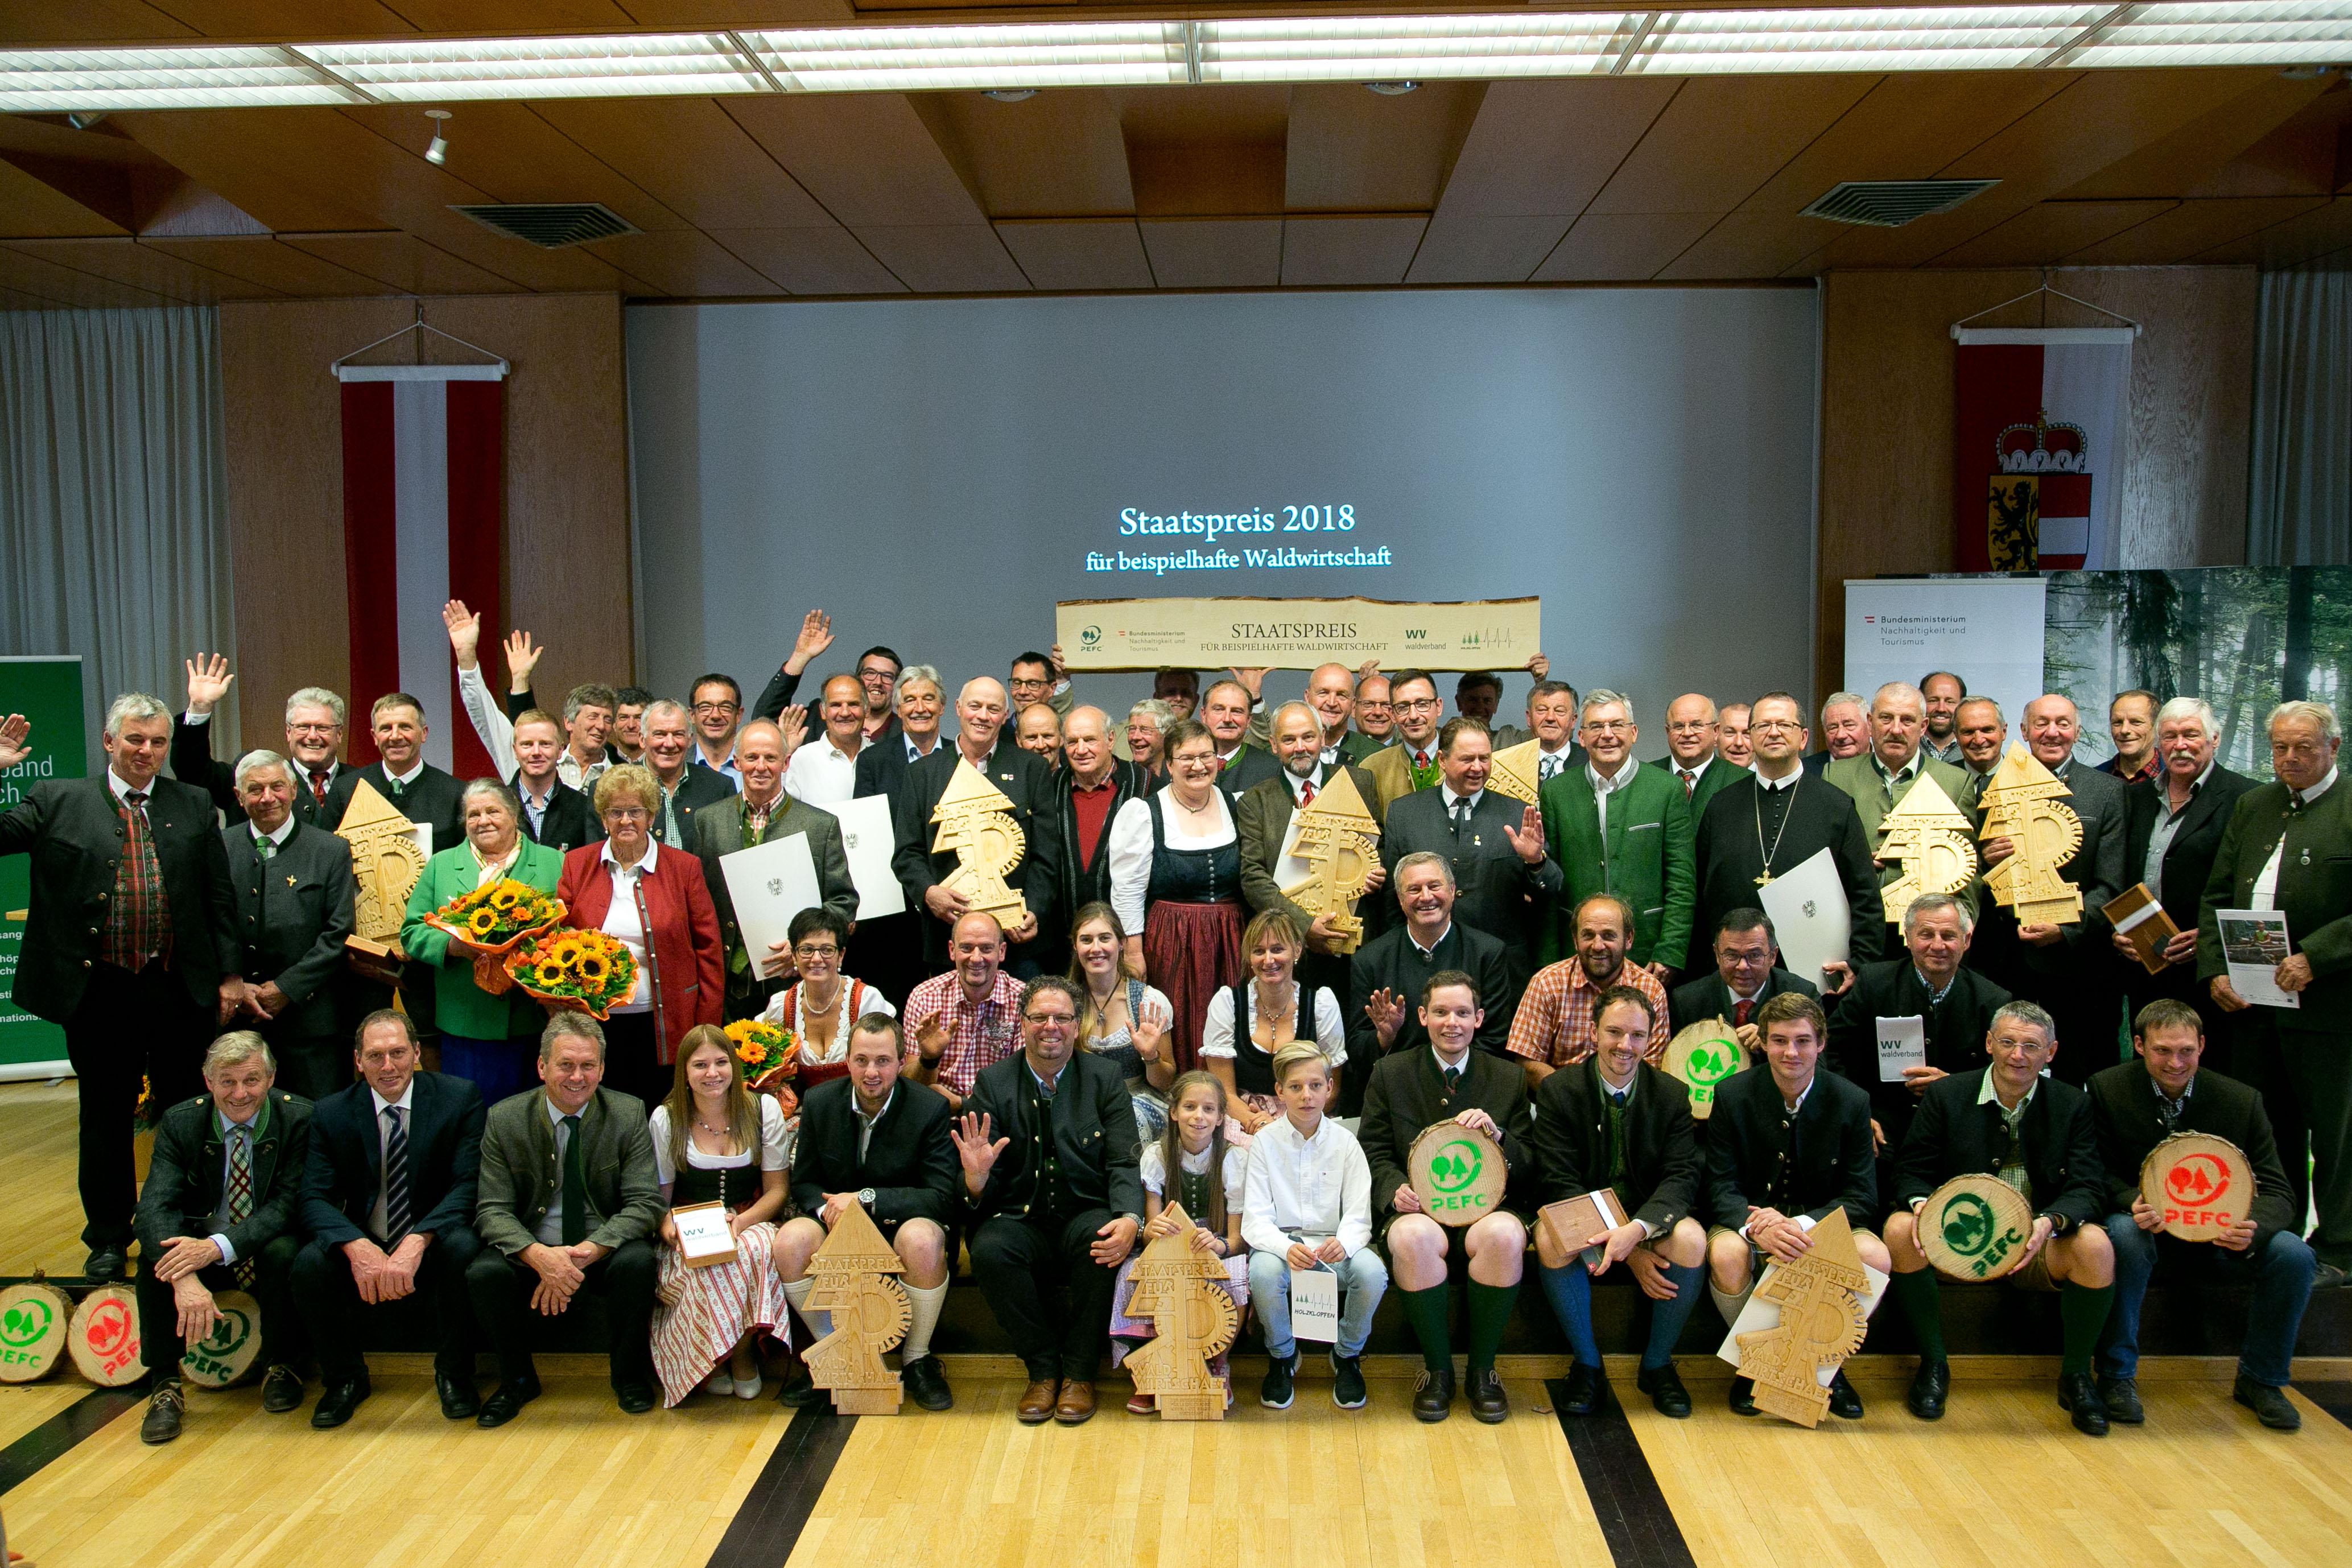 Staatspreisverleihung in Salzburg